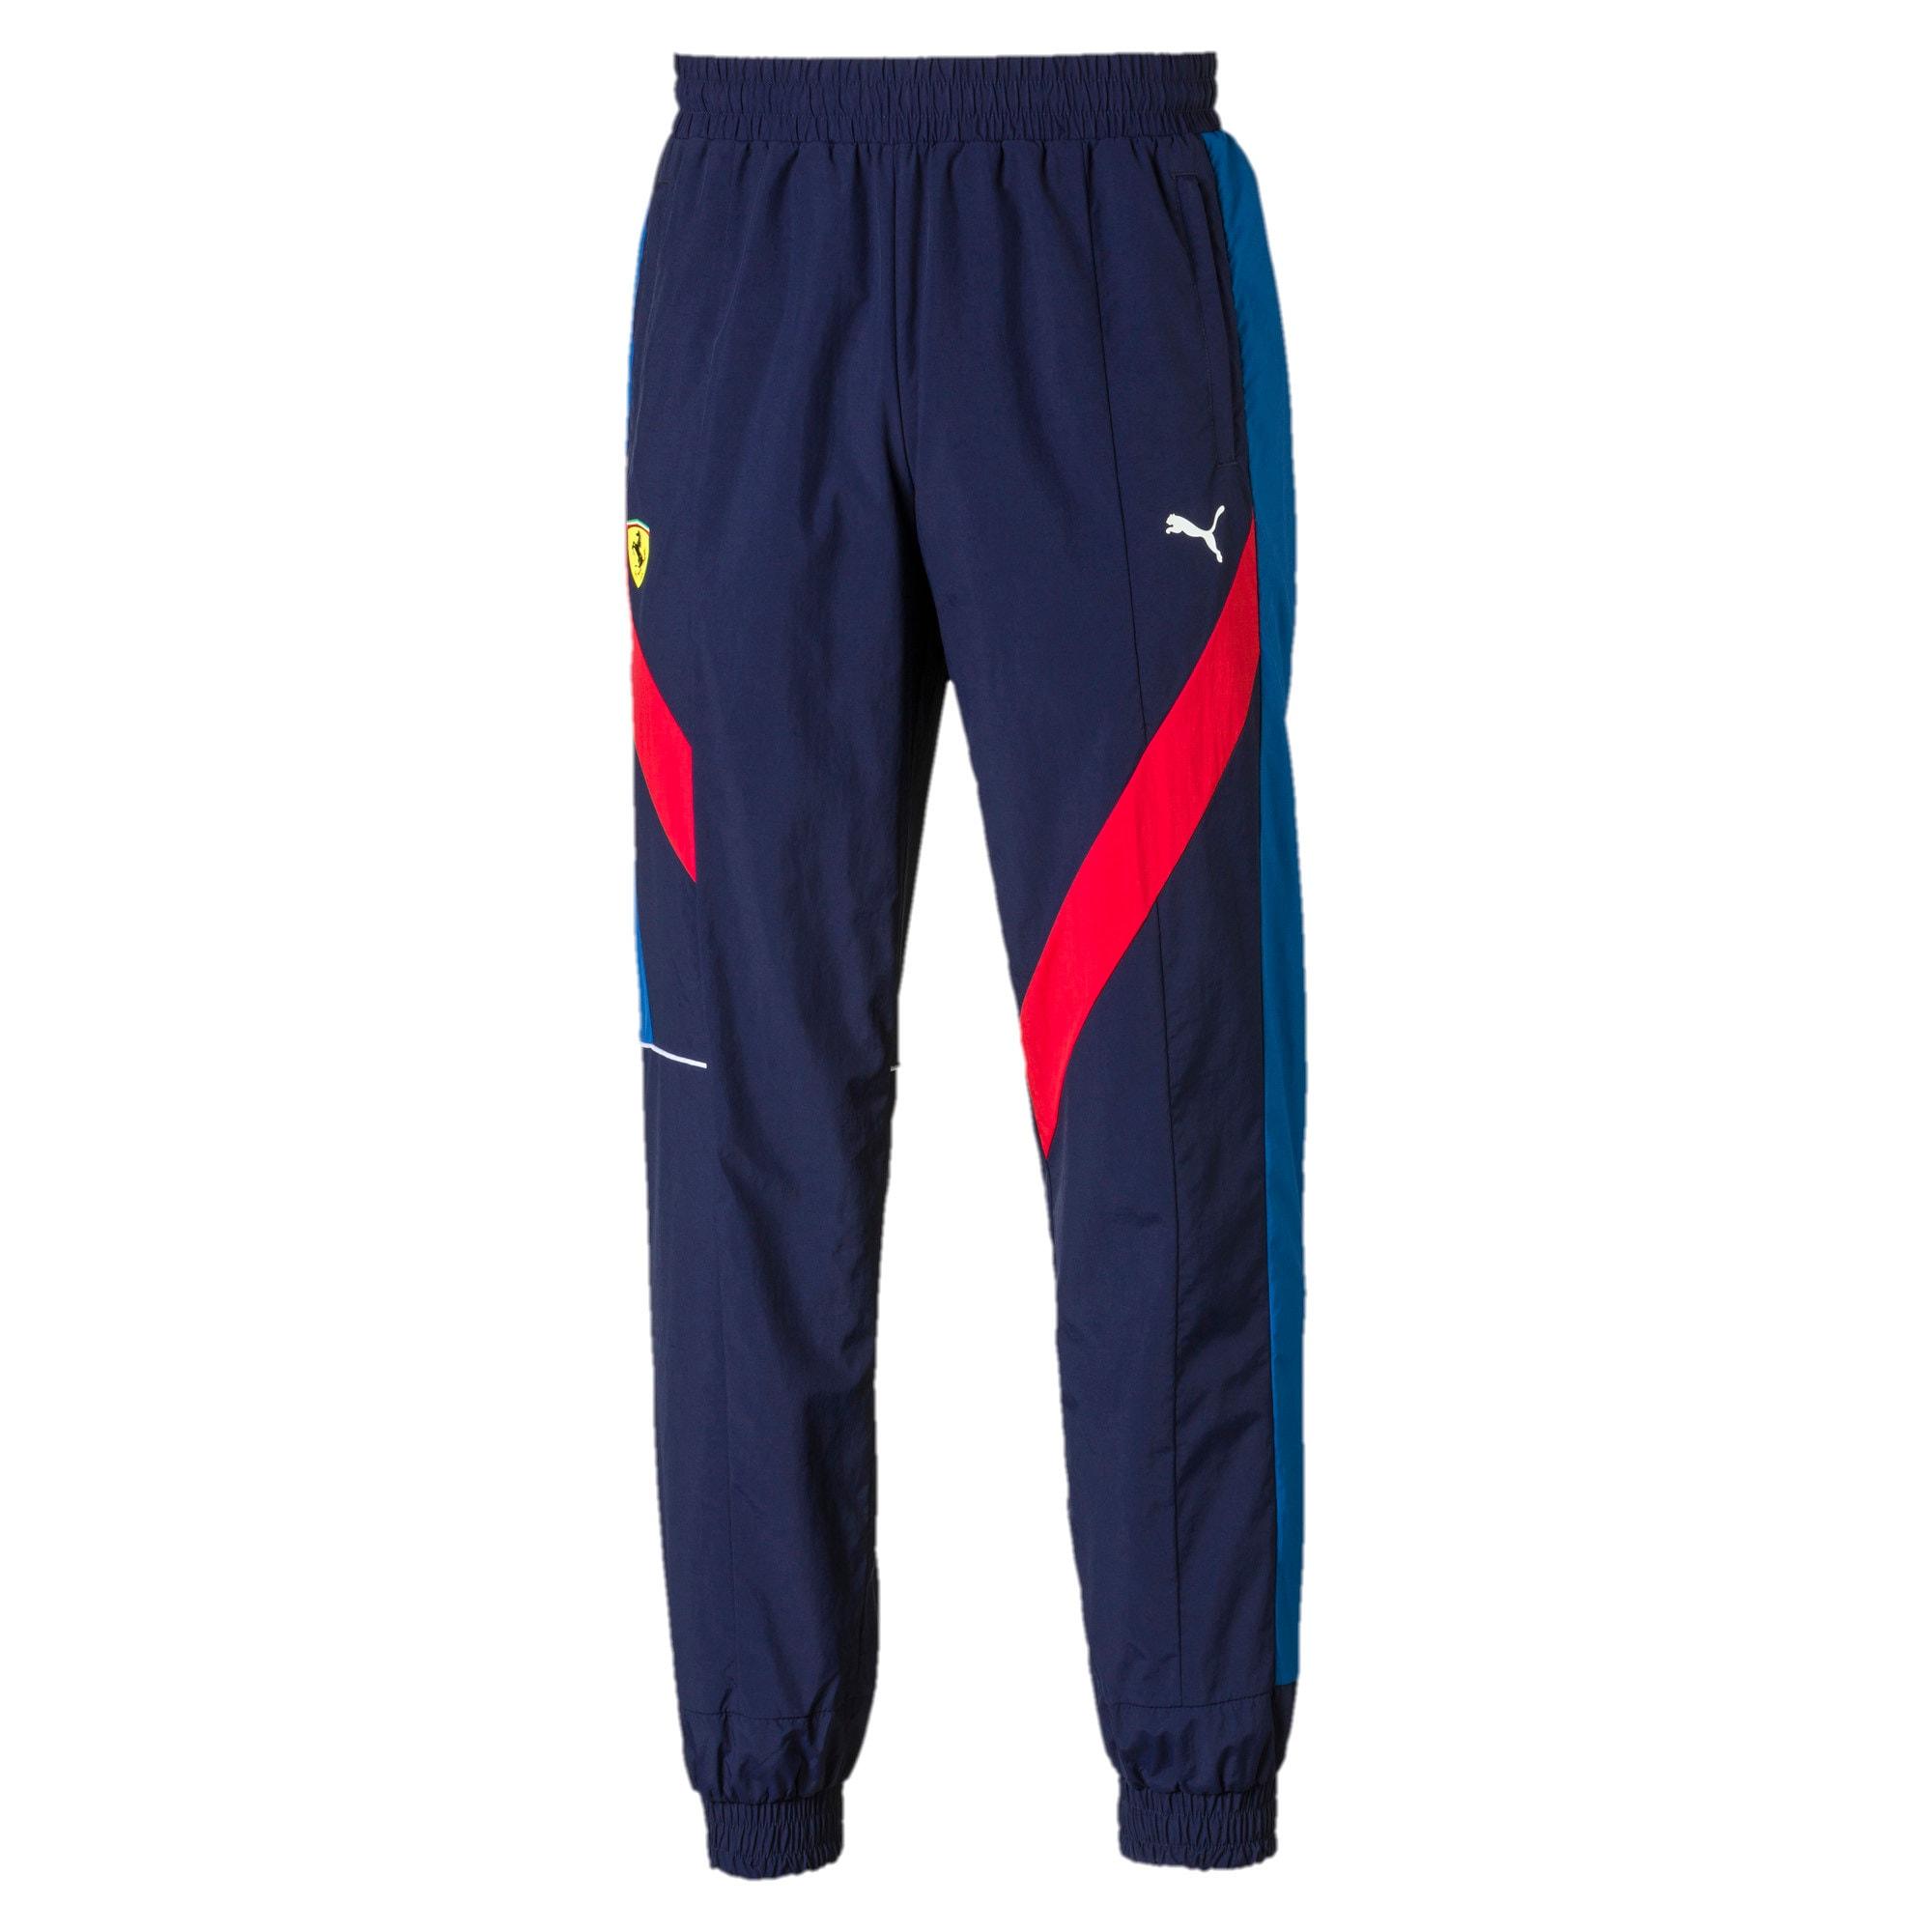 Thumbnail 2 of Ferrari Street Woven Men's Pants, Galaxy Blue, medium